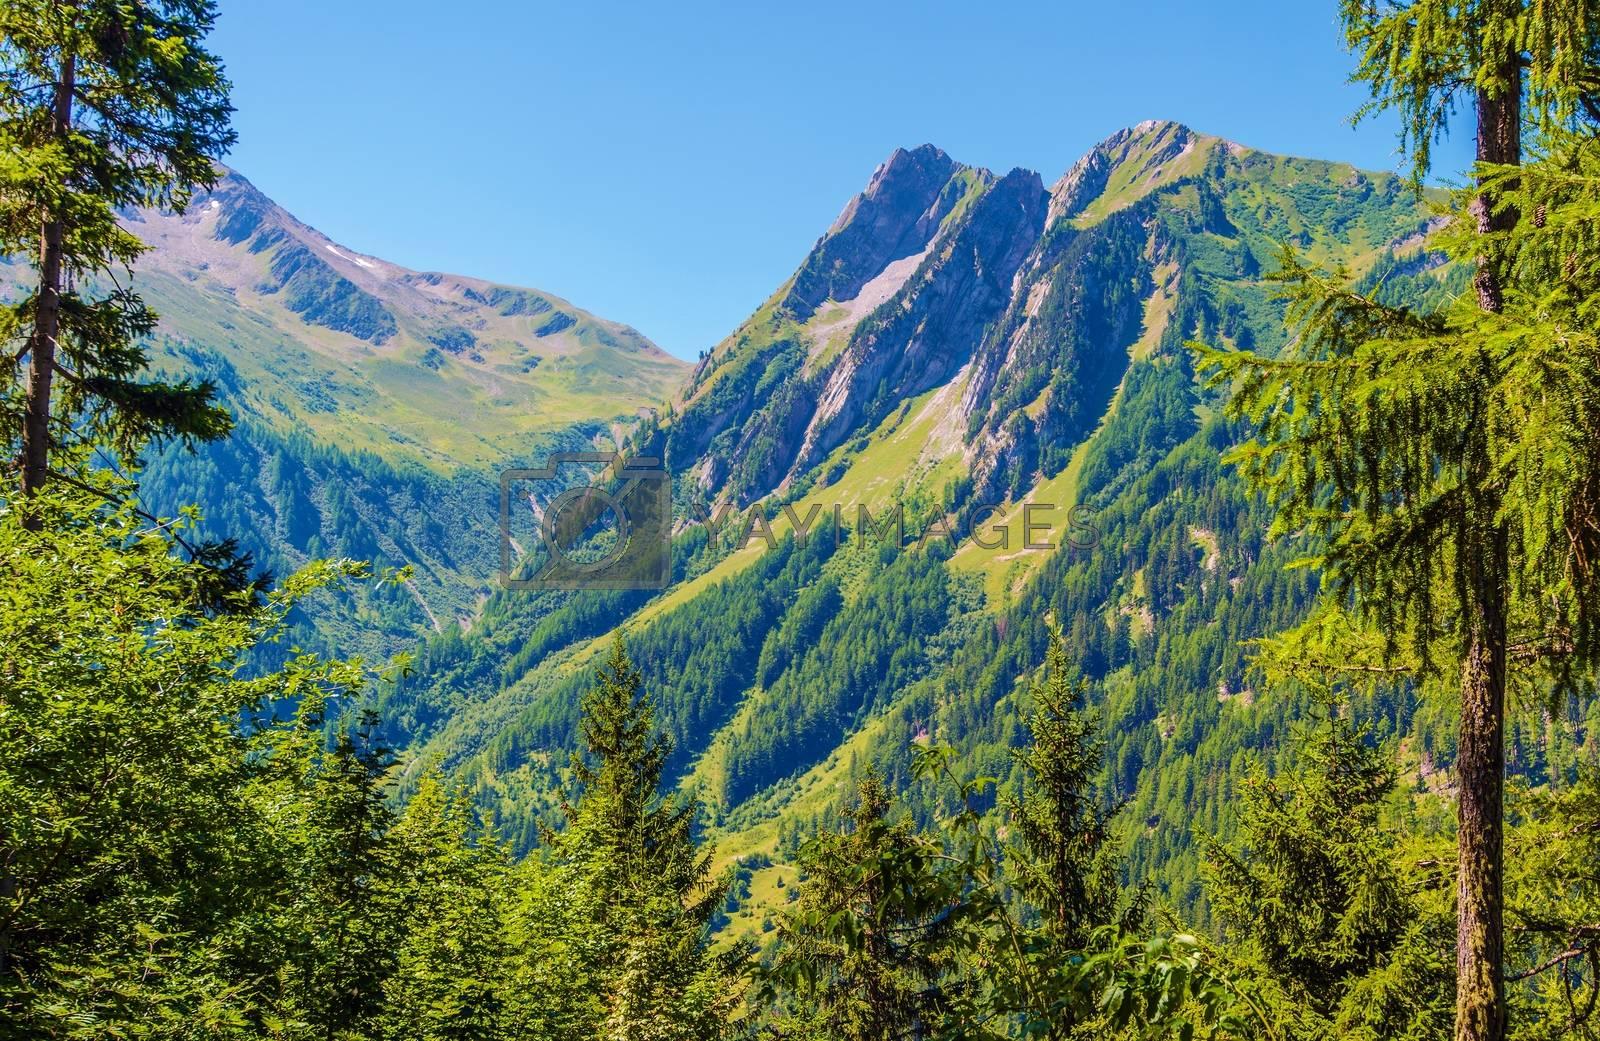 Switzerland Mountain Landscape in a Summer. Scenic Switzerland Alps.